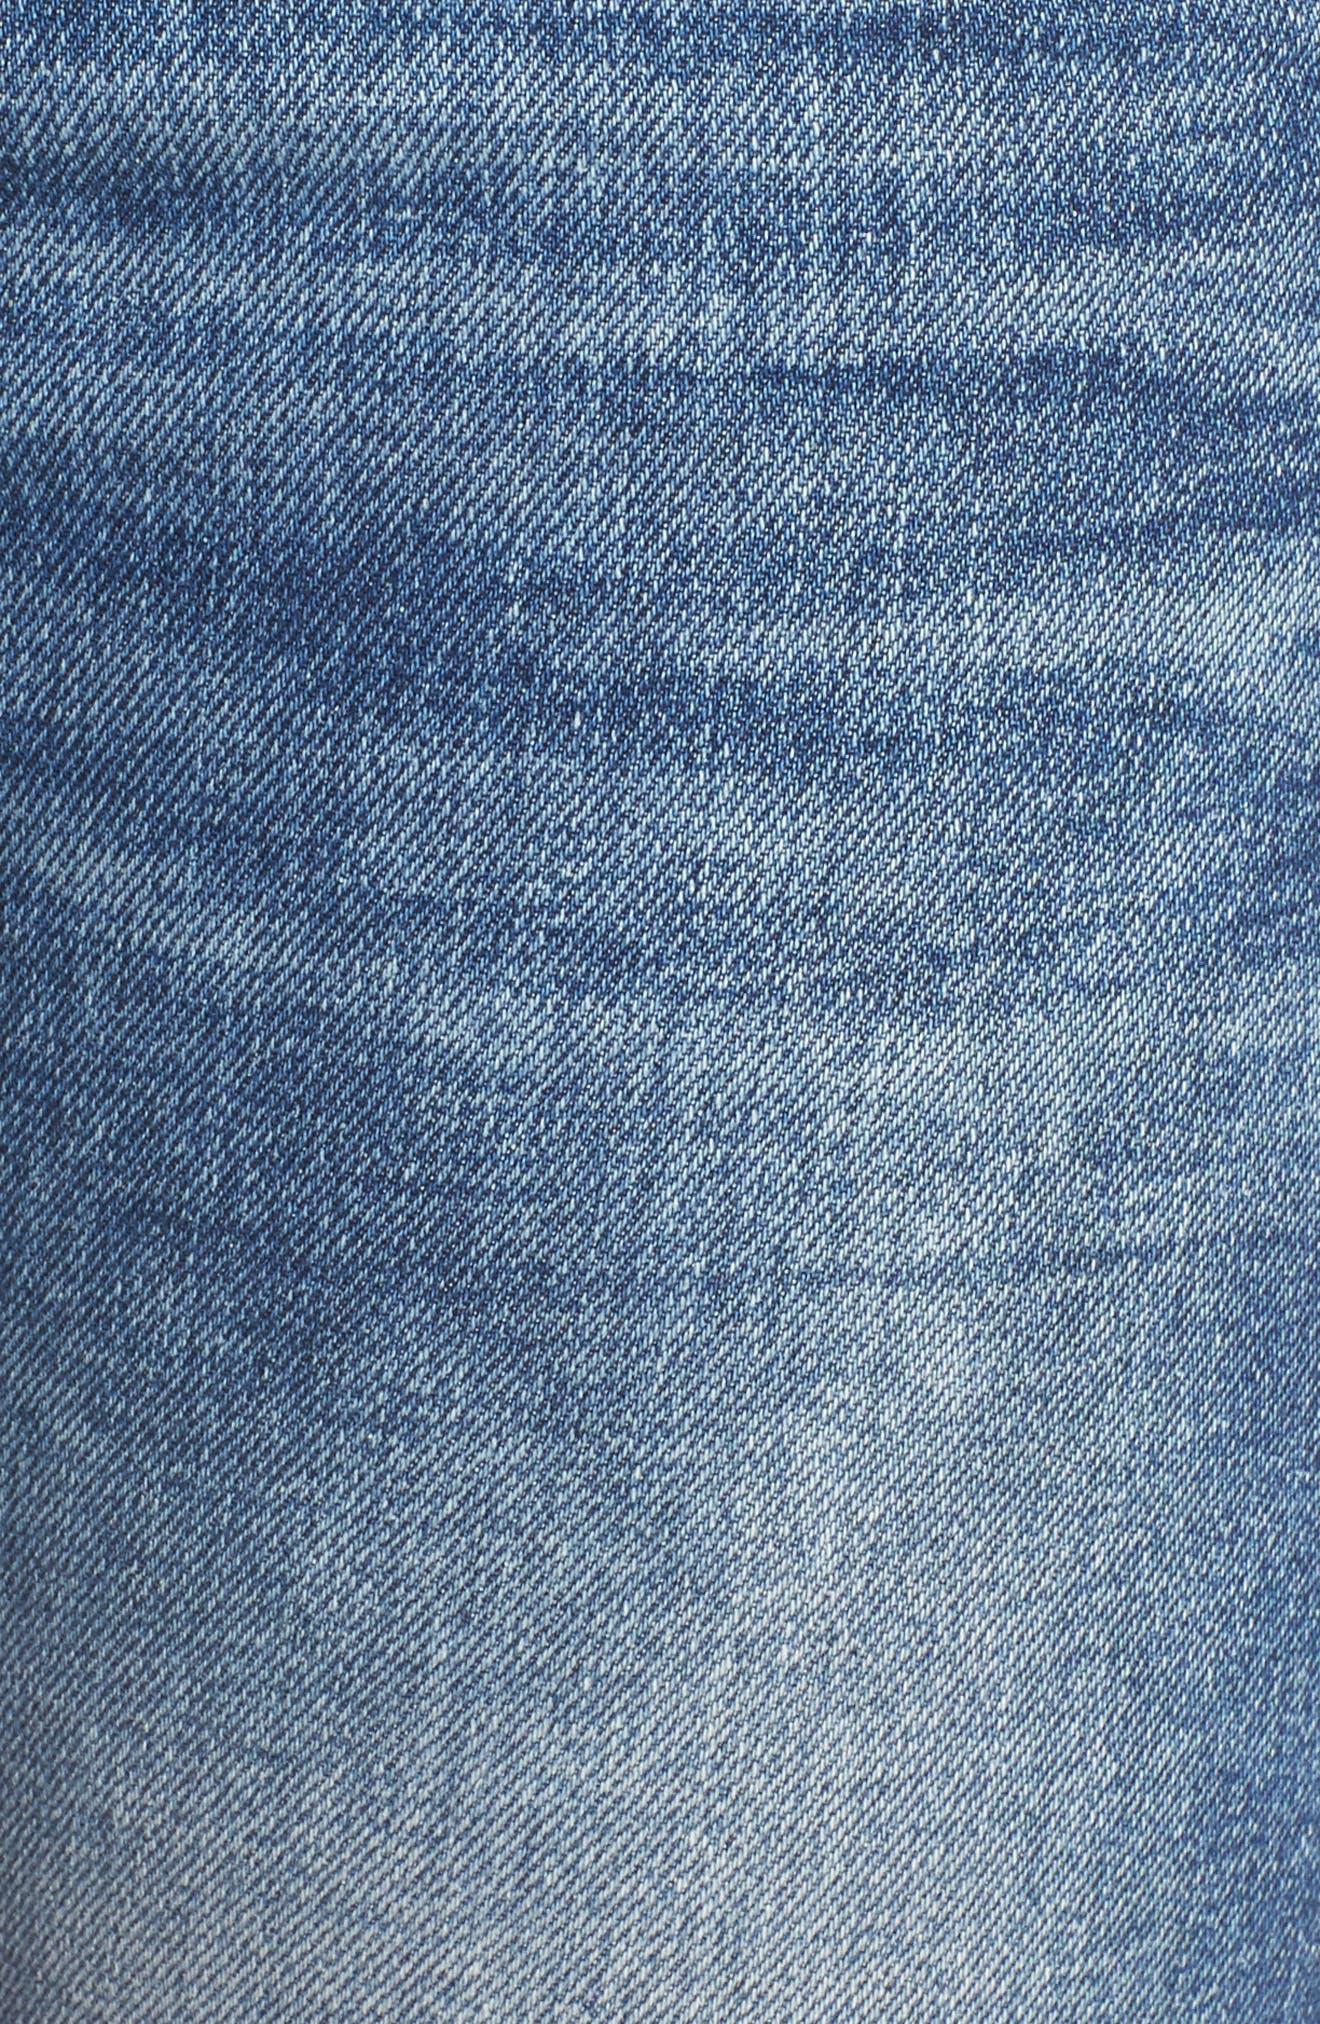 Alternate Image 5  - Mavi Jeans Lucy Ripped Skinny Jeans (Foggy)